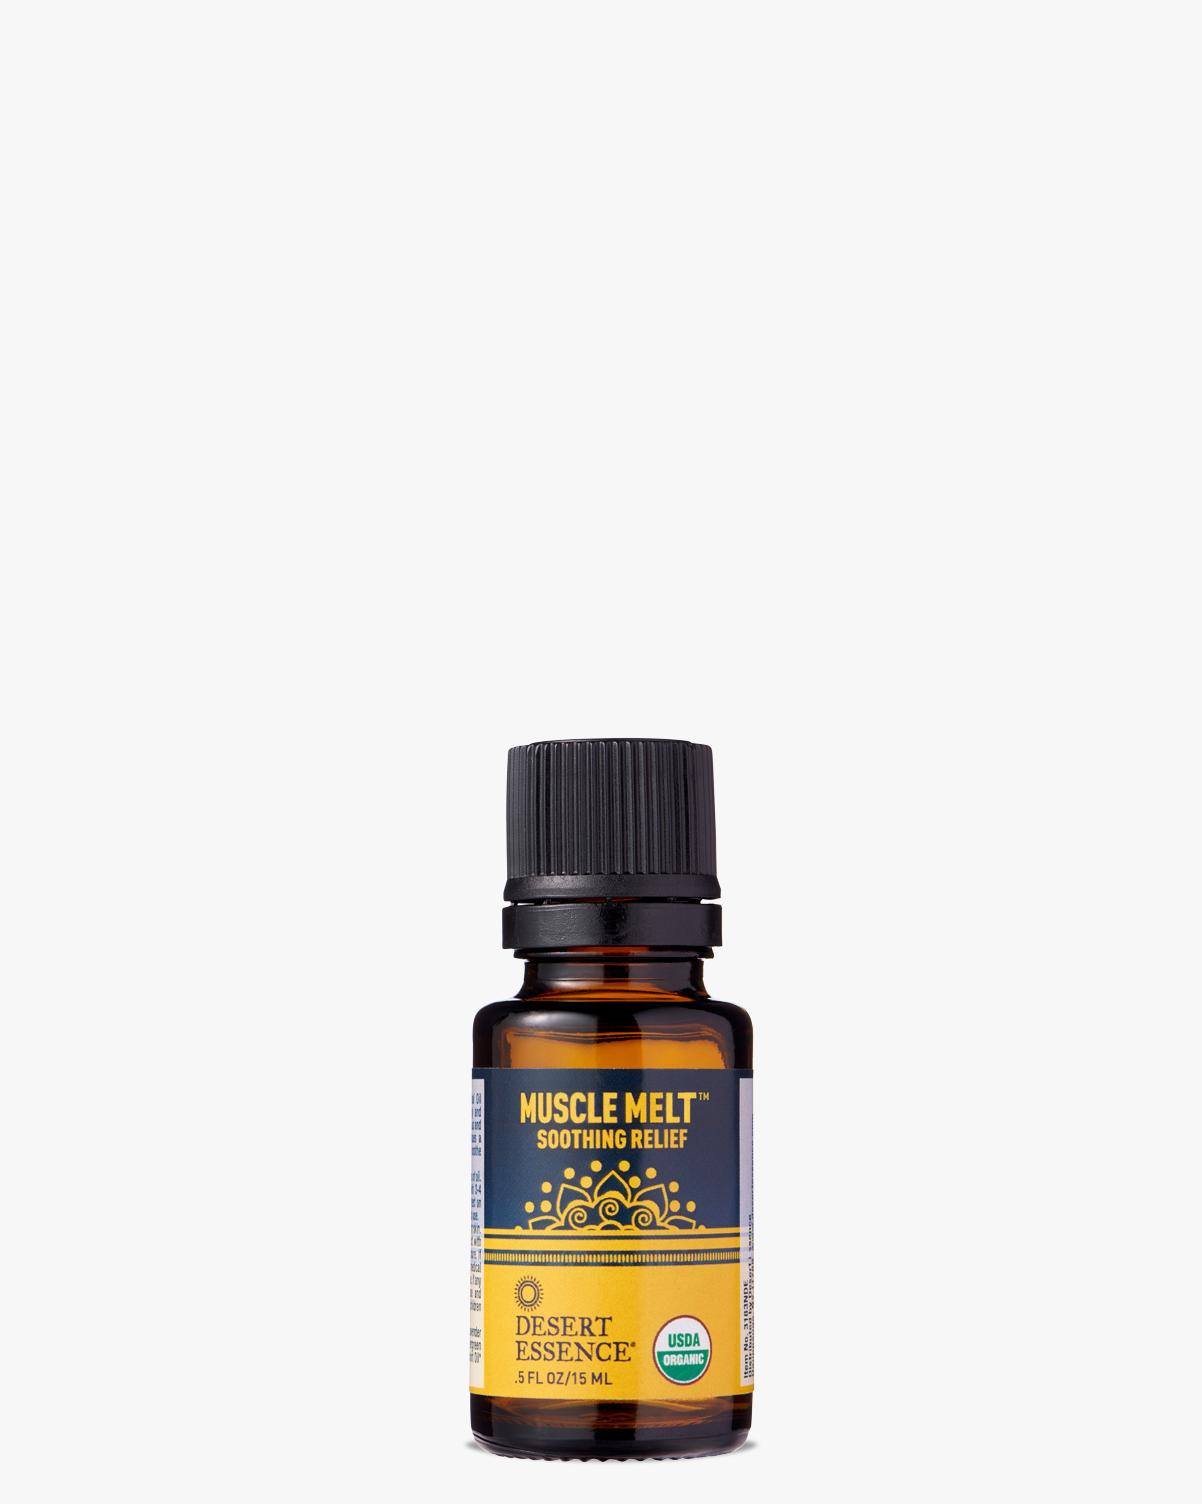 Desert Essence coupon: Desert Essence Muscle Melt Organic Essential Oil, 0.5 fl. oz. | Vegan | Gluten-Free